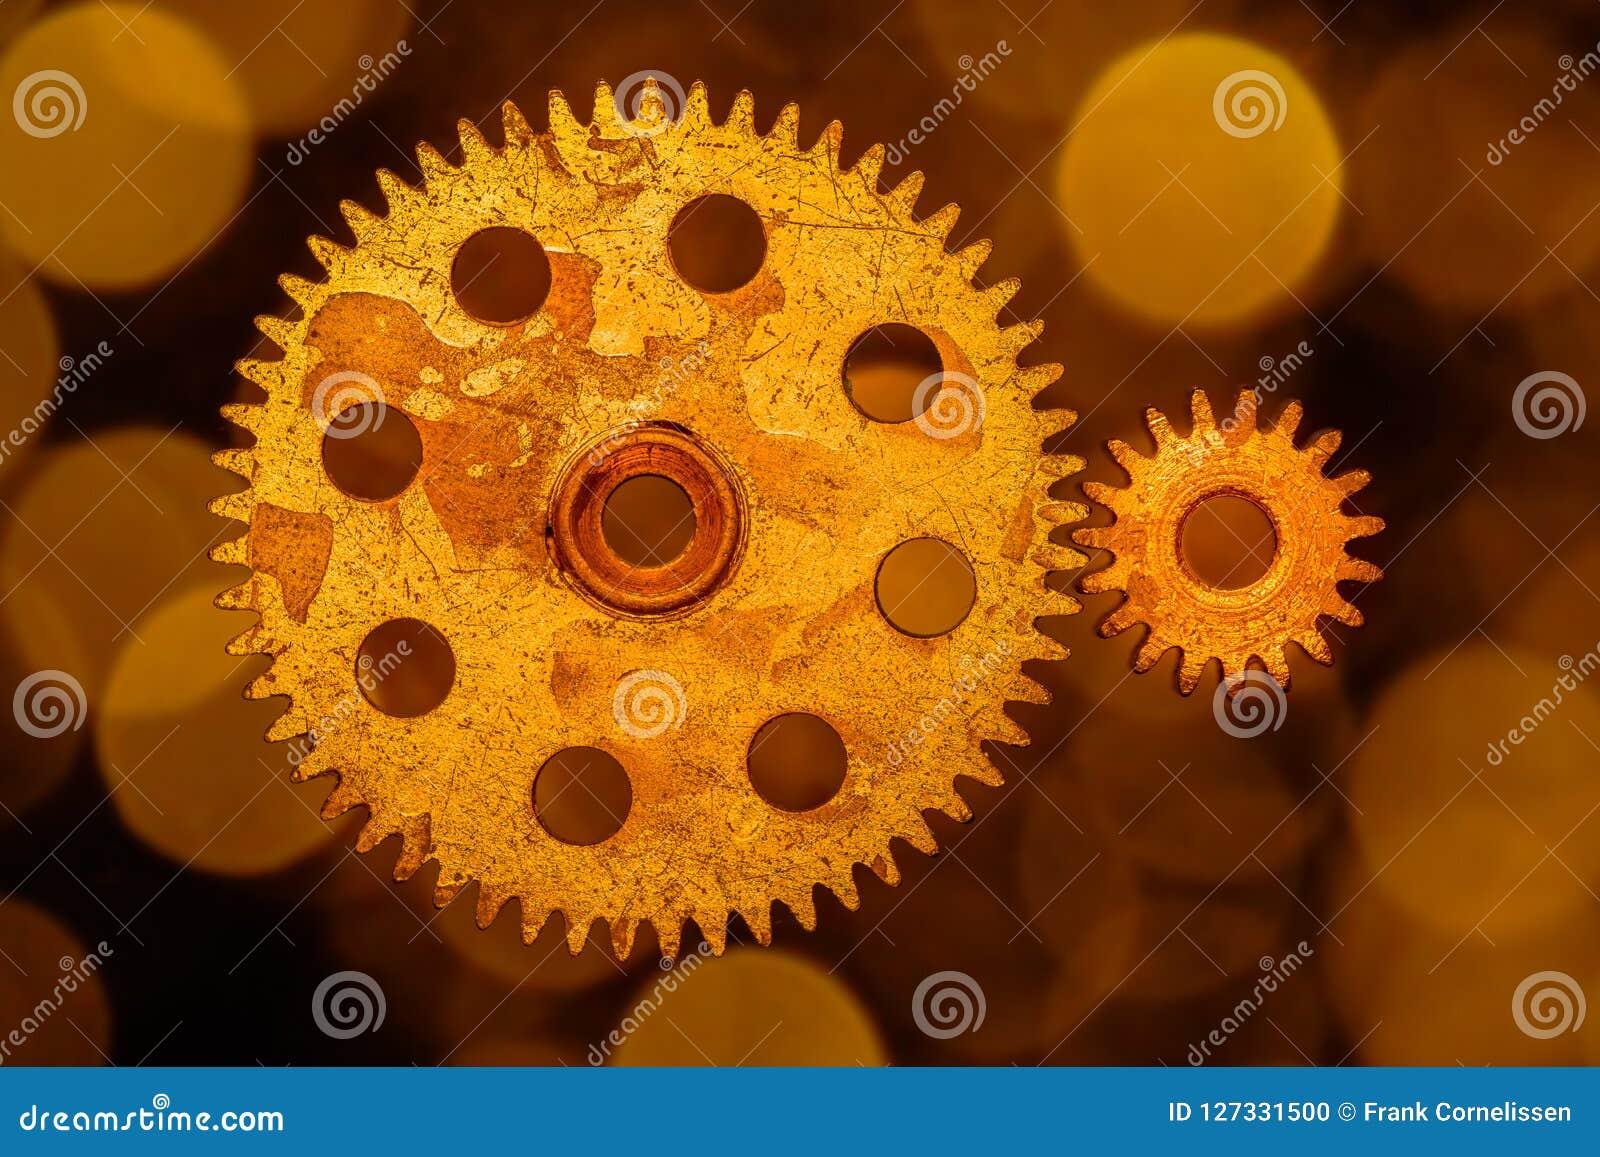 Golden cogwheels on a background of gold circled bokeh.